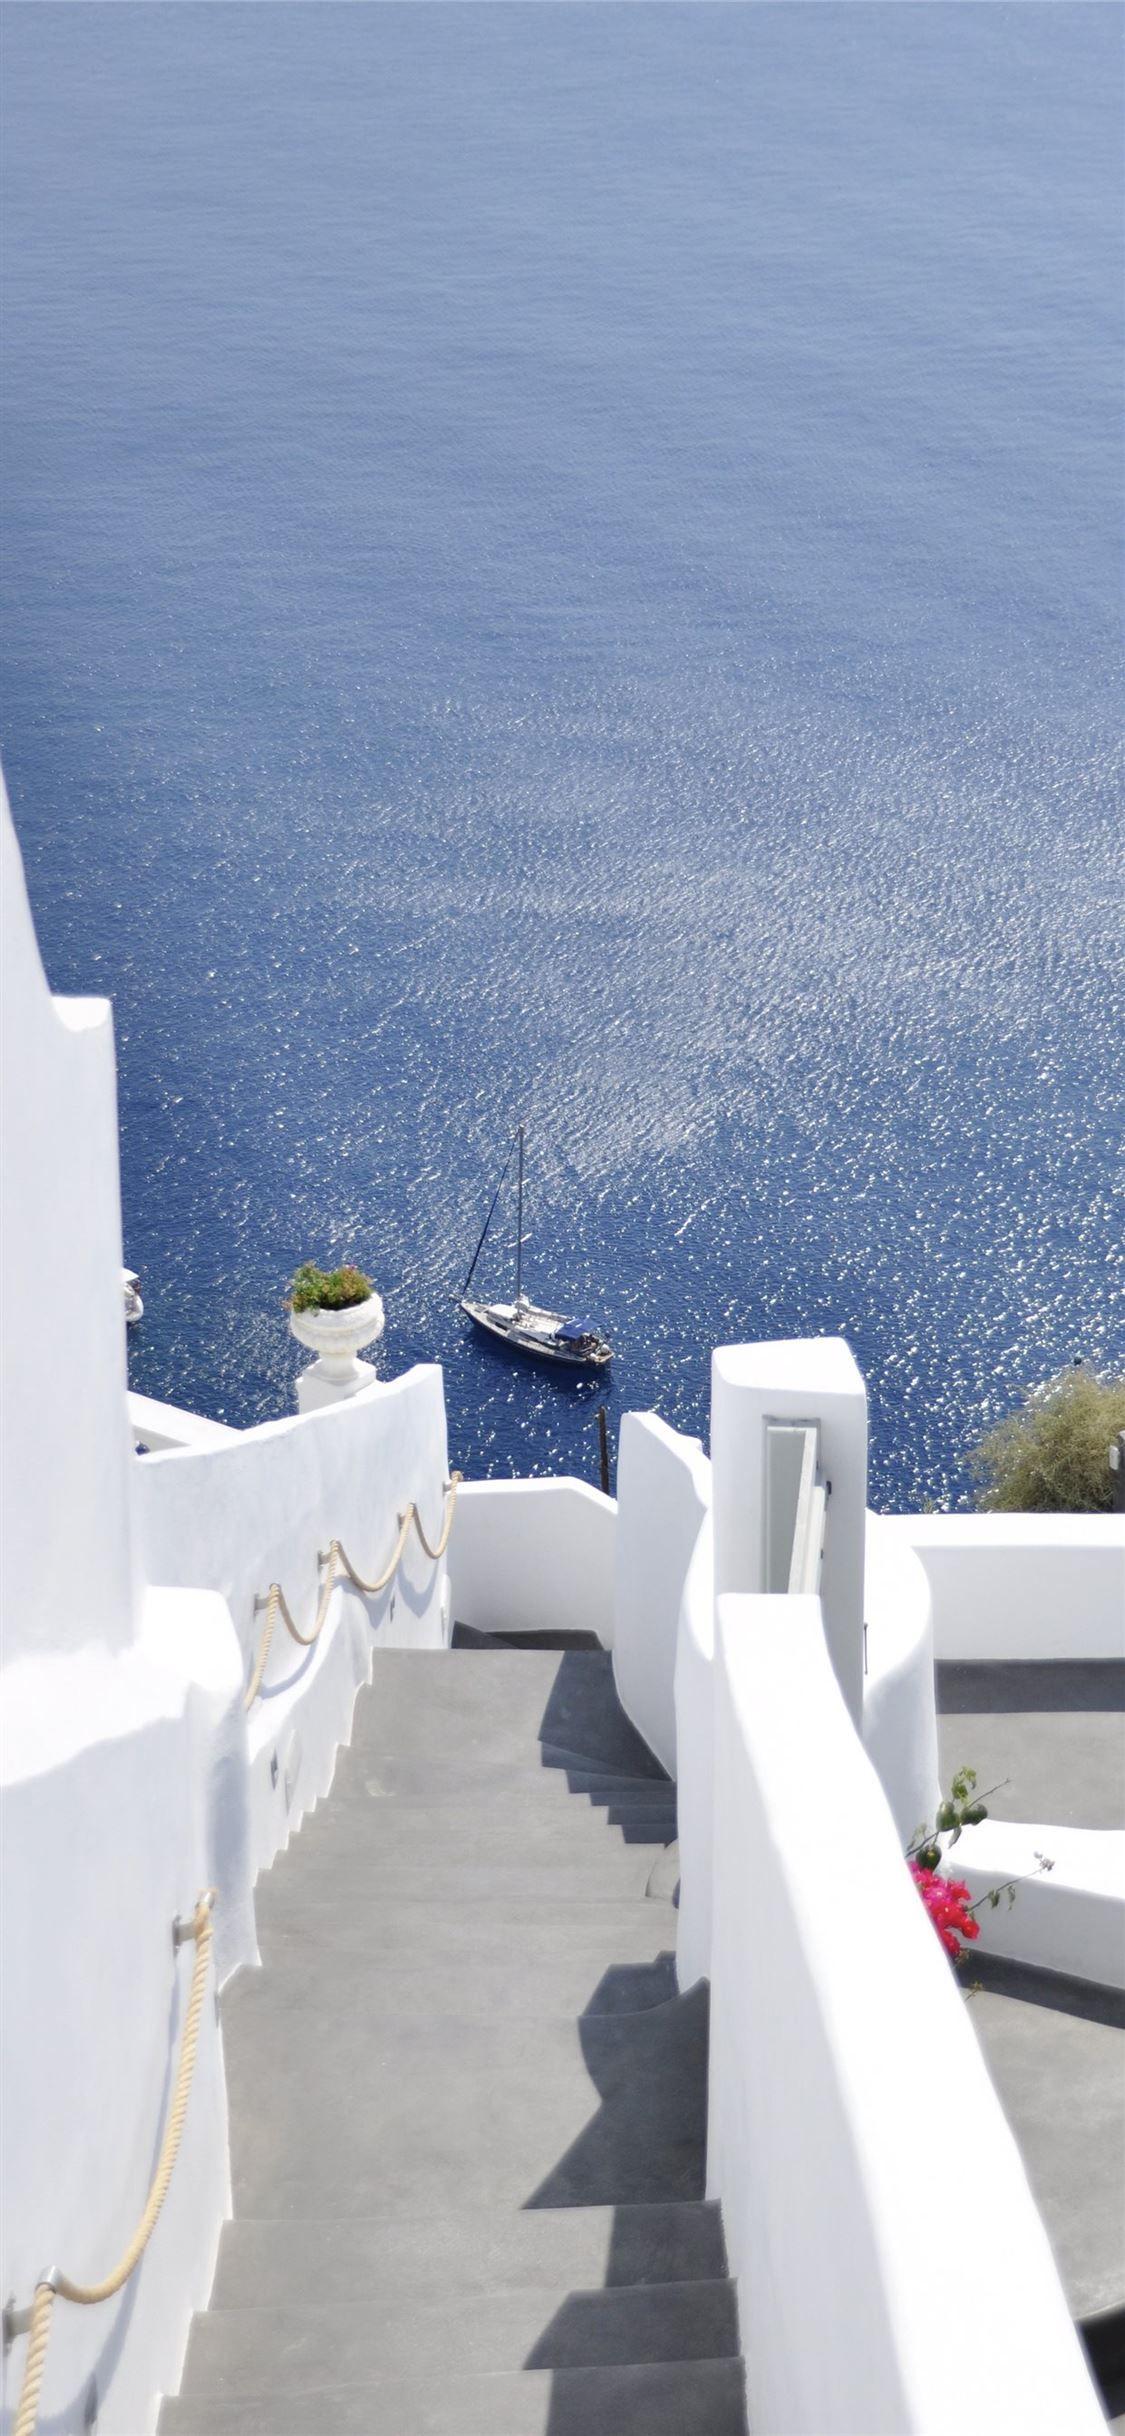 Santorini Santorini 100mostbeautifulplacestovisit Greece Iphone11wallpaper Live Wallpaper Iphone Greece Wallpaper Ios 11 Wallpaper Free live wallpapers for iphone 11